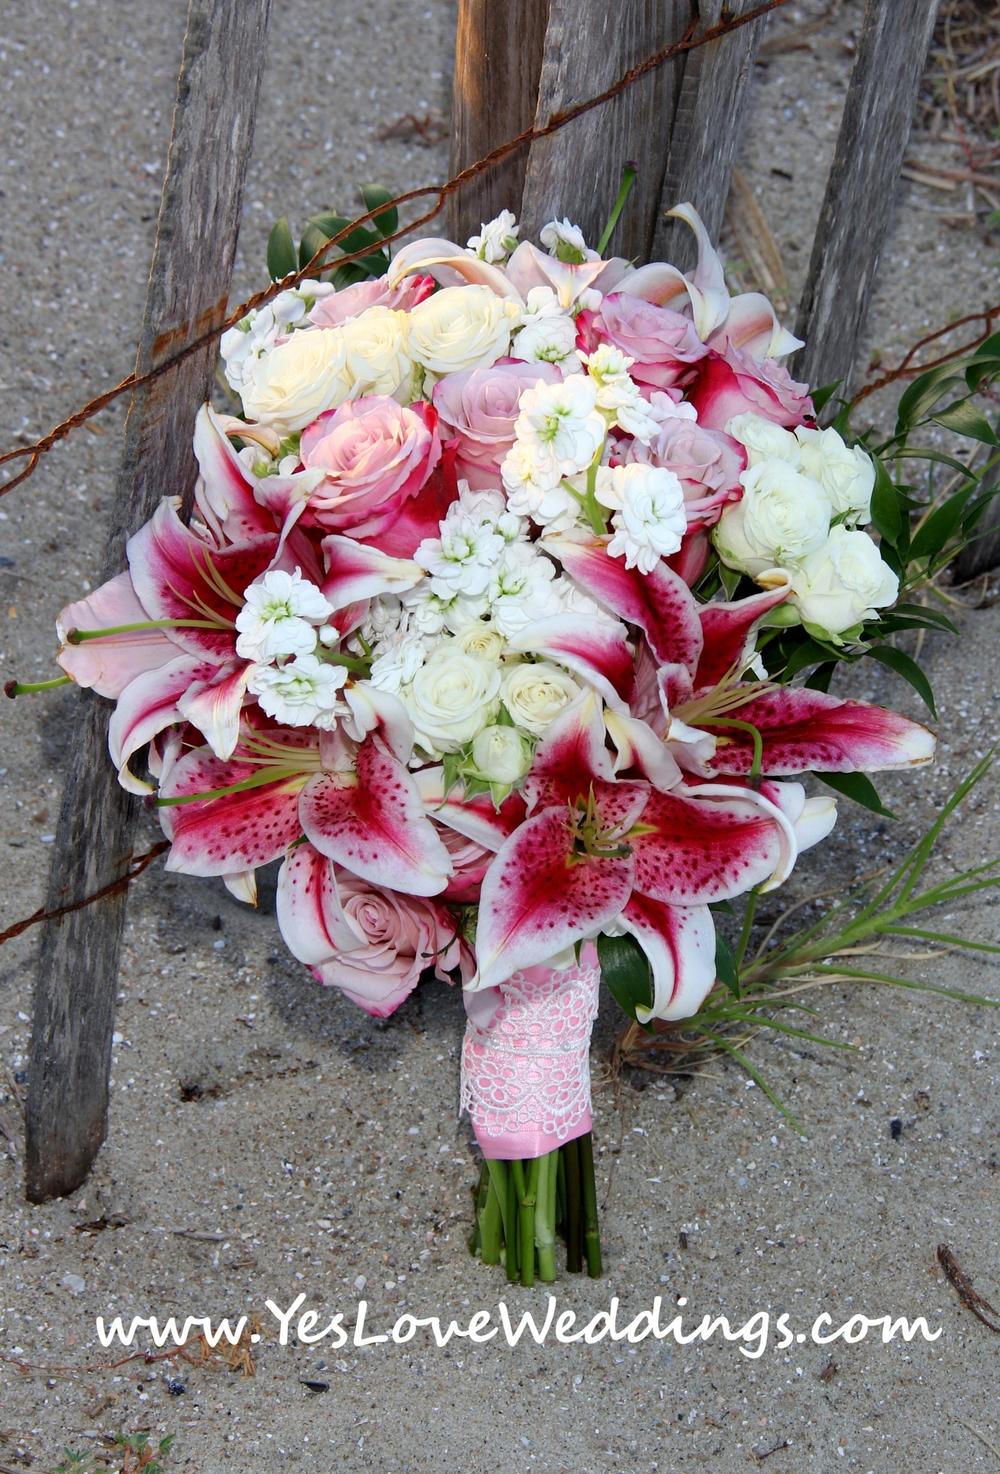 Stargazer lily bride's bouquet